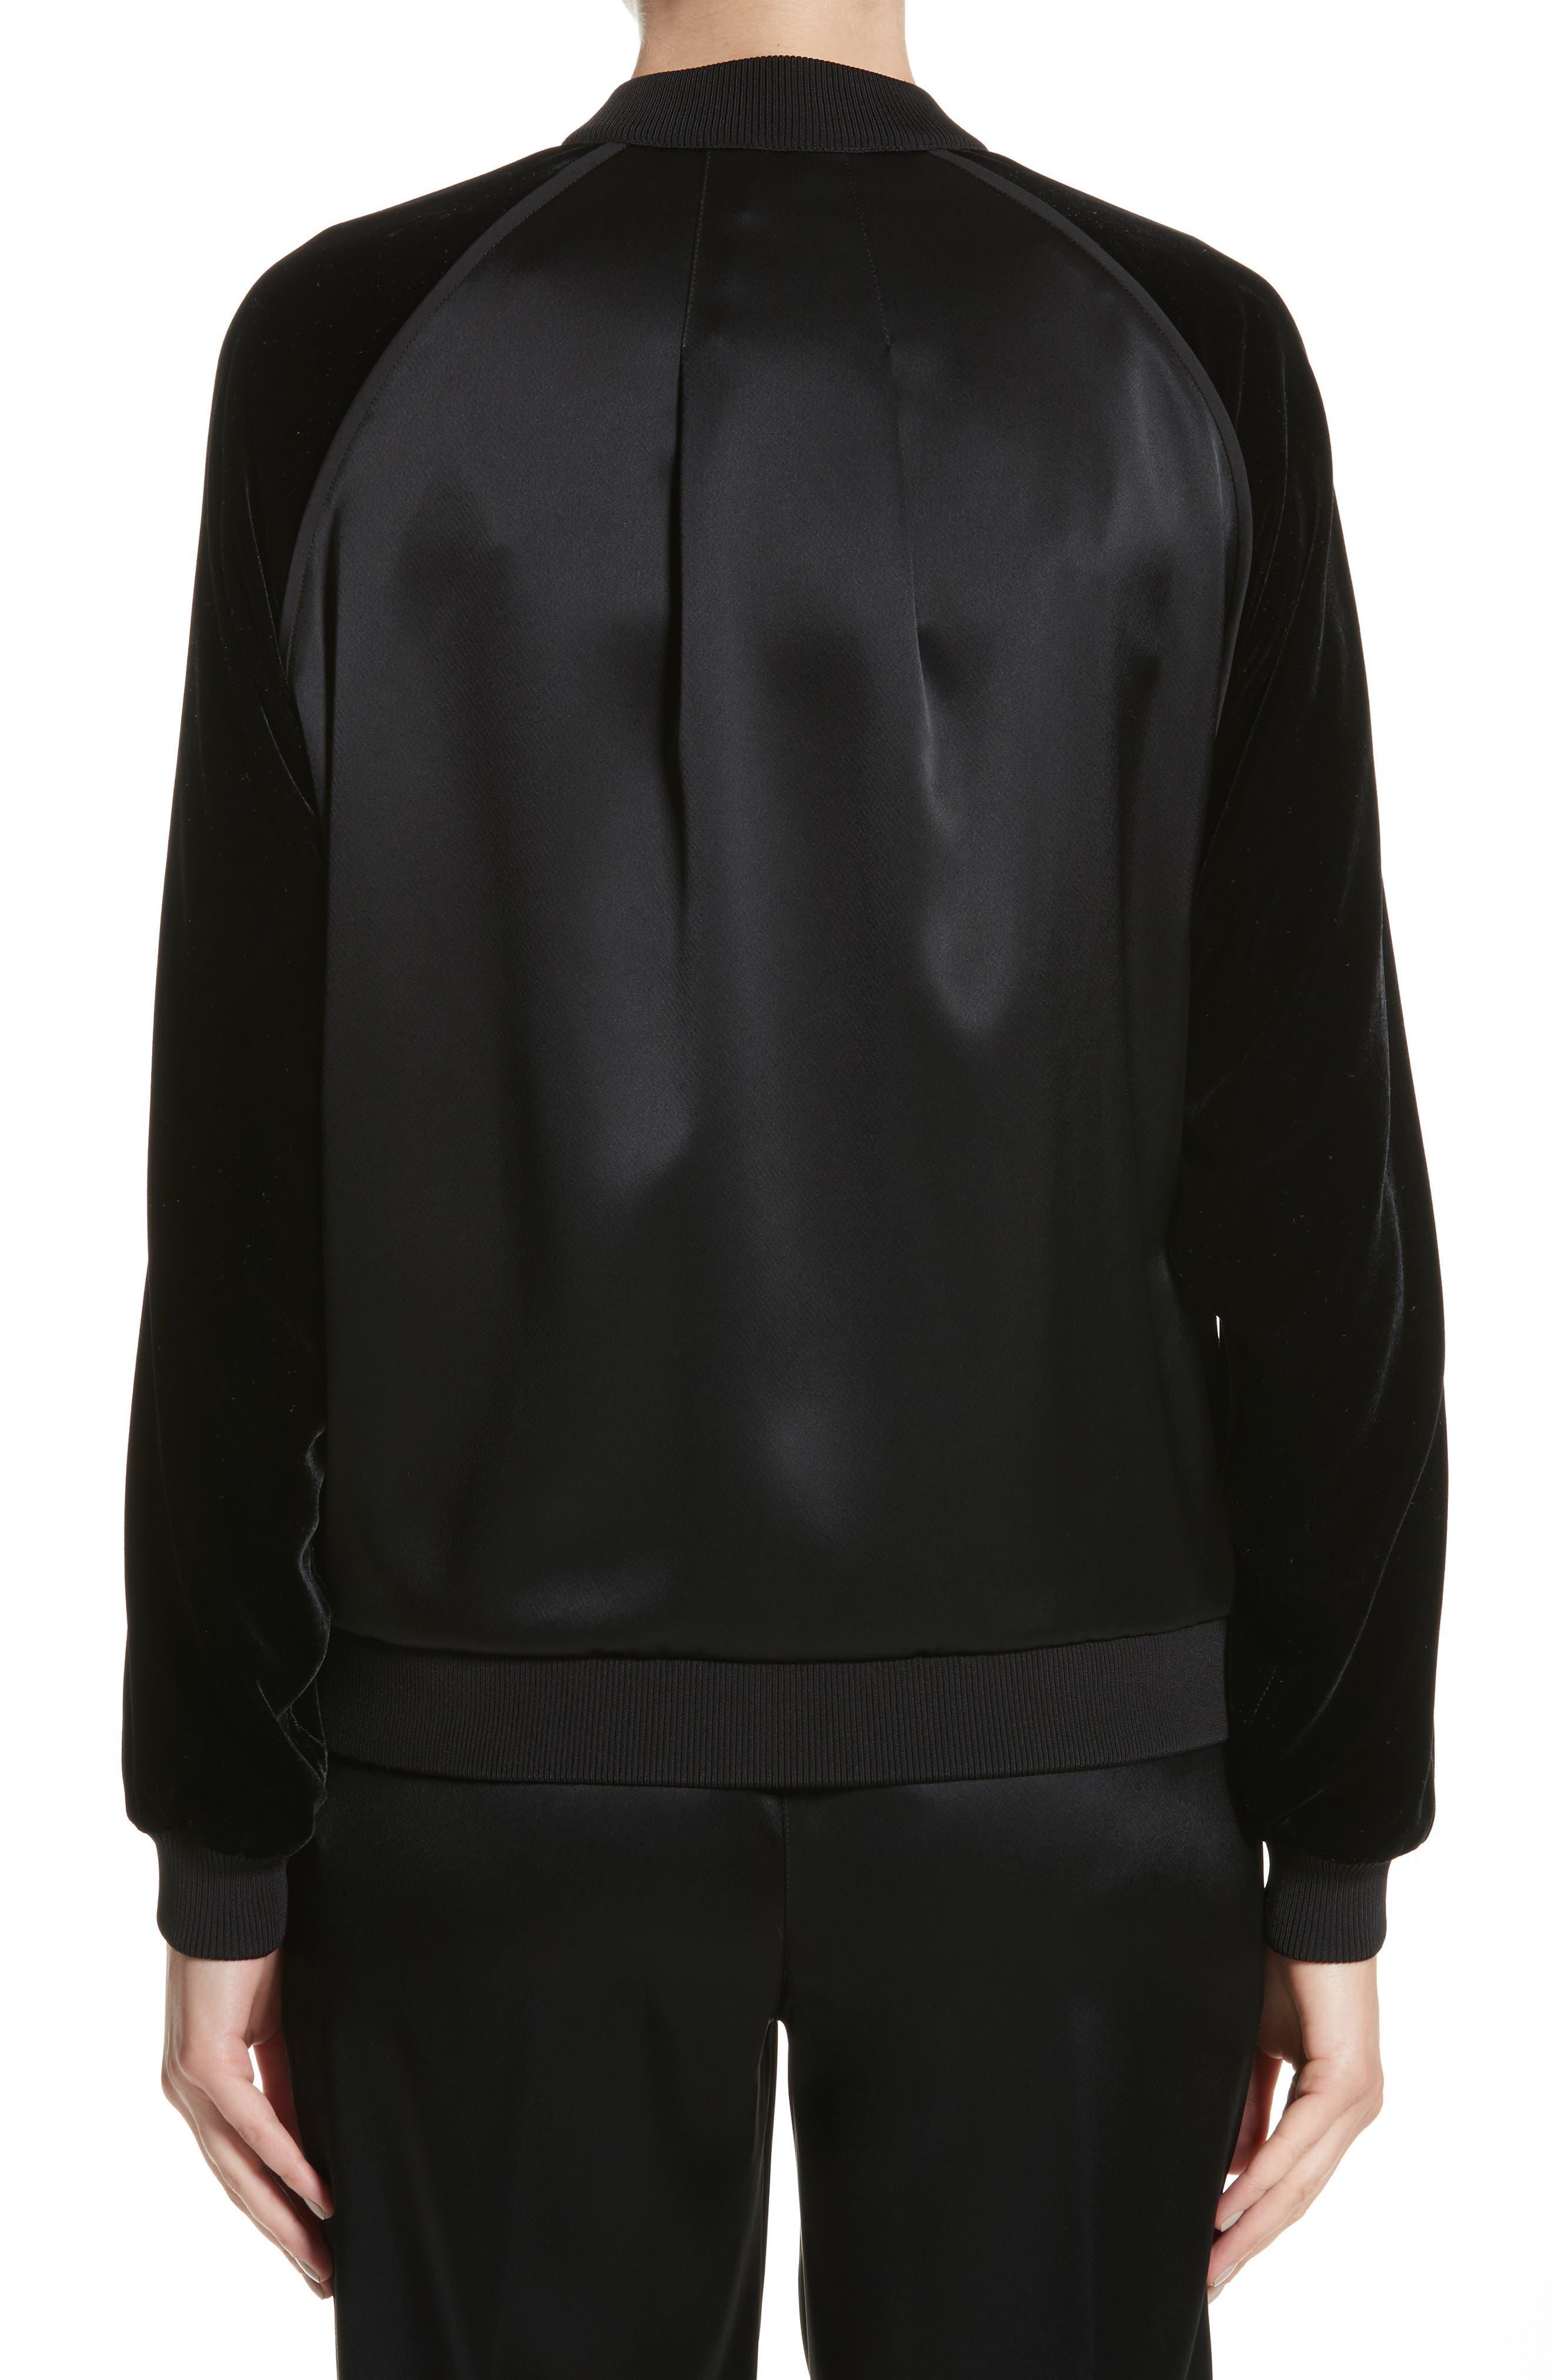 Brea Reverie Satin Cloth Bomber Jacket,                             Alternate thumbnail 2, color,                             001